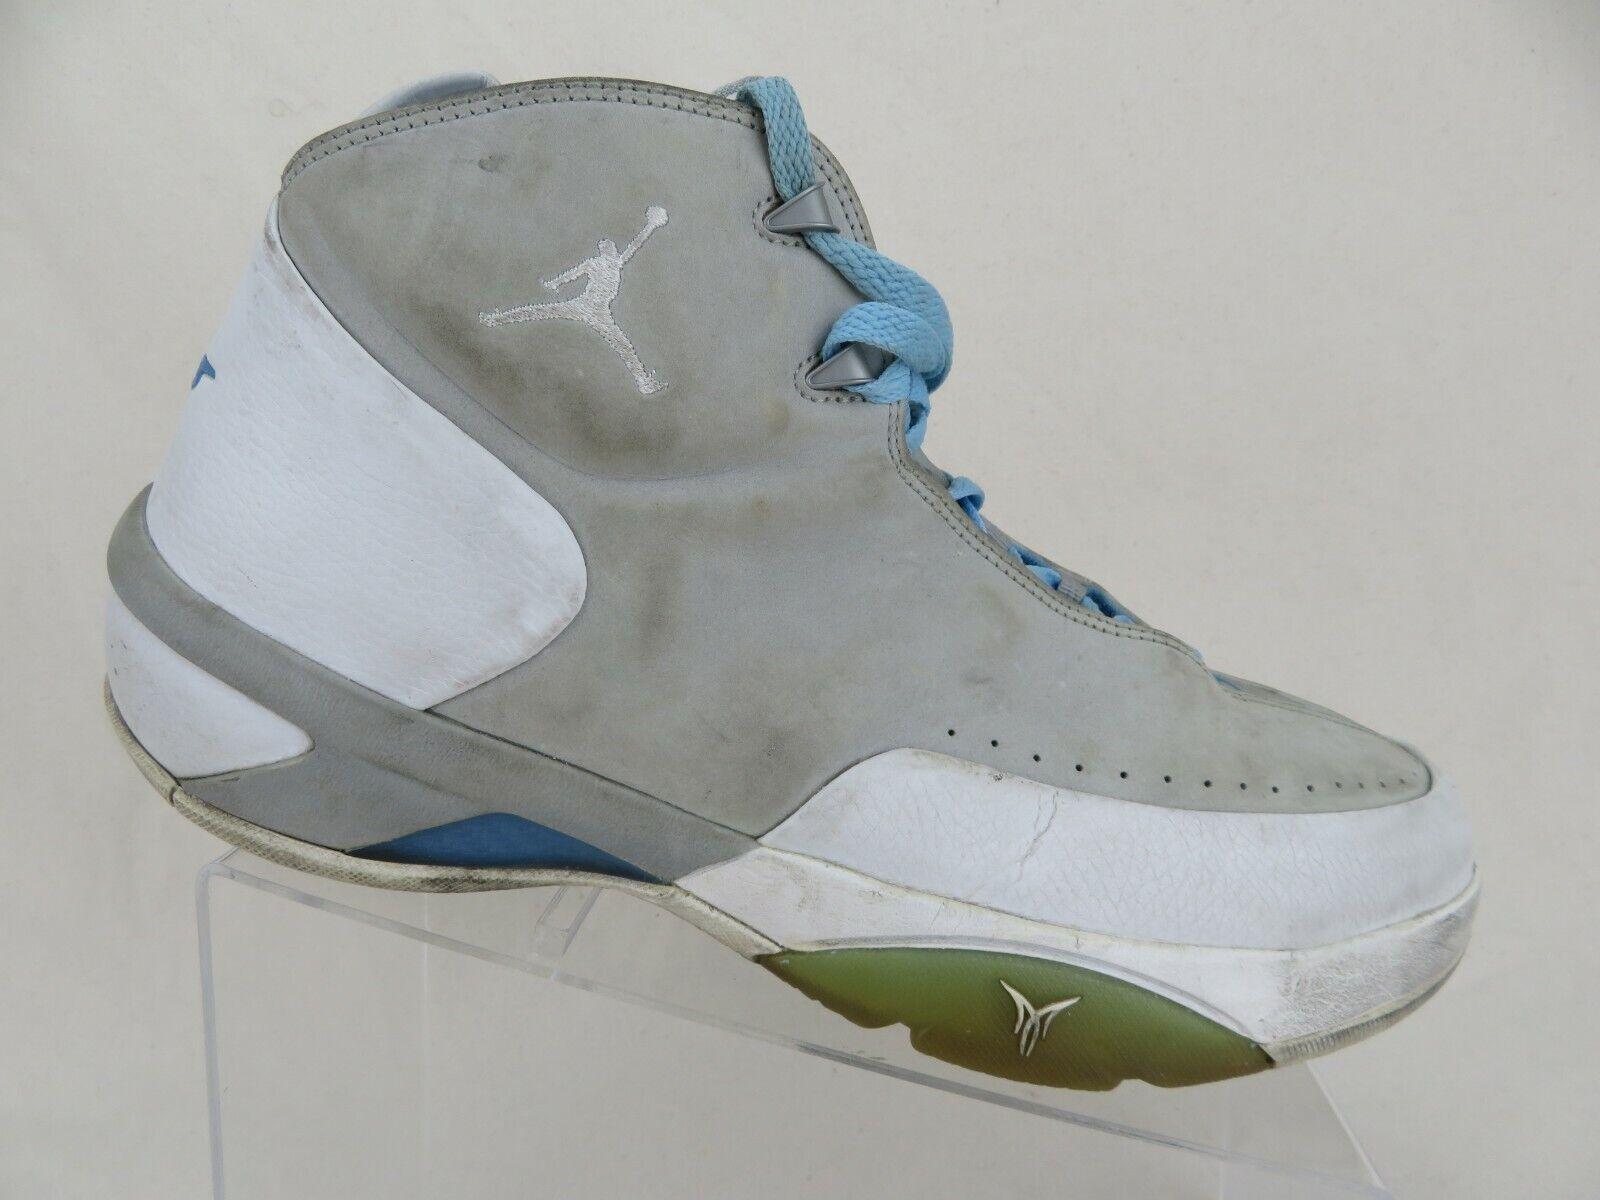 JORDAN Melo M3 University bluee Sz 11.5 Men Basketball shoes